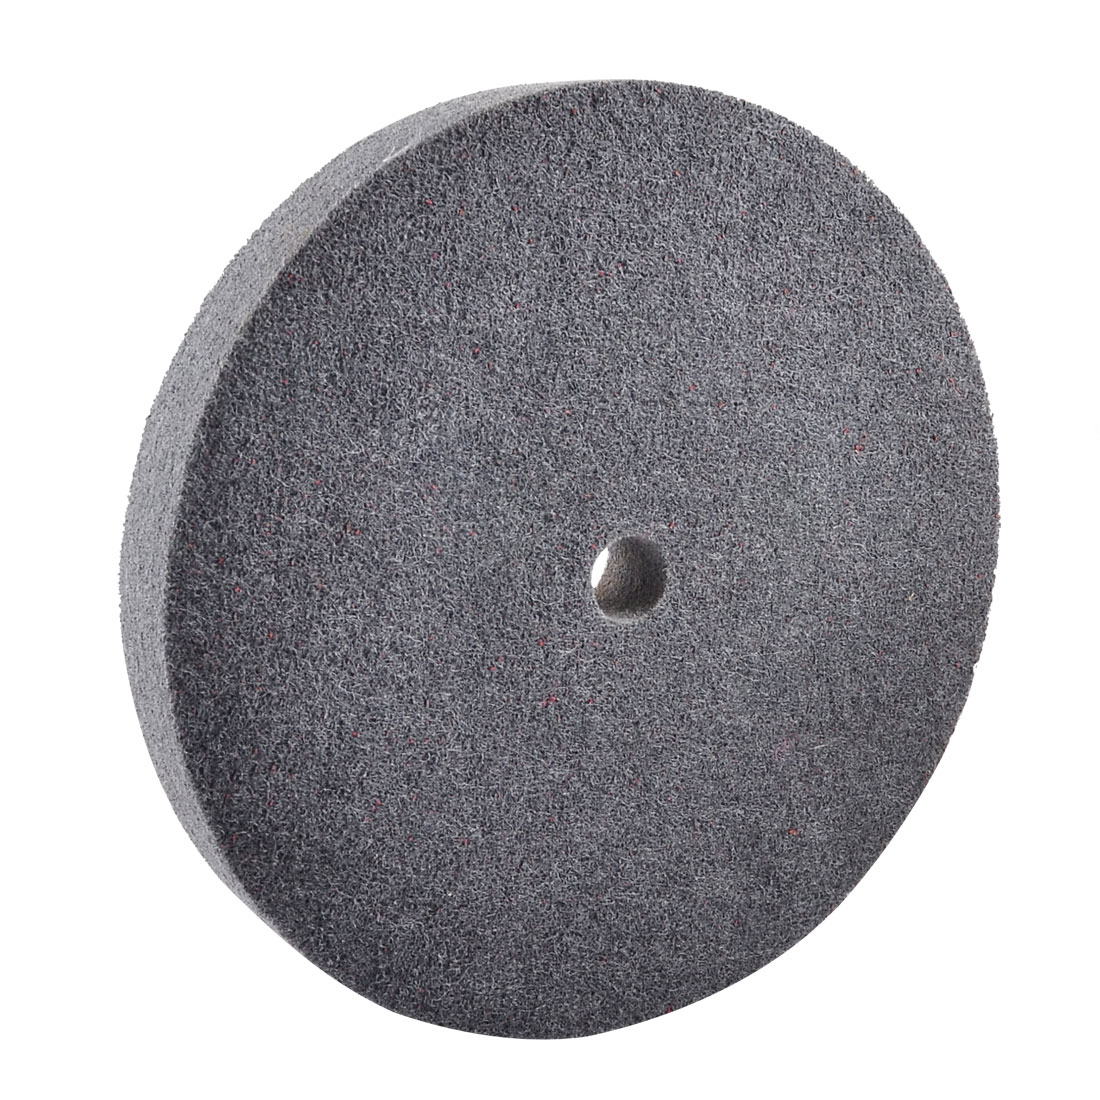 "8"" Outside Dia 12P 320# Grit Dark Gray Nylon Polishing Wheel Disc Pad by"